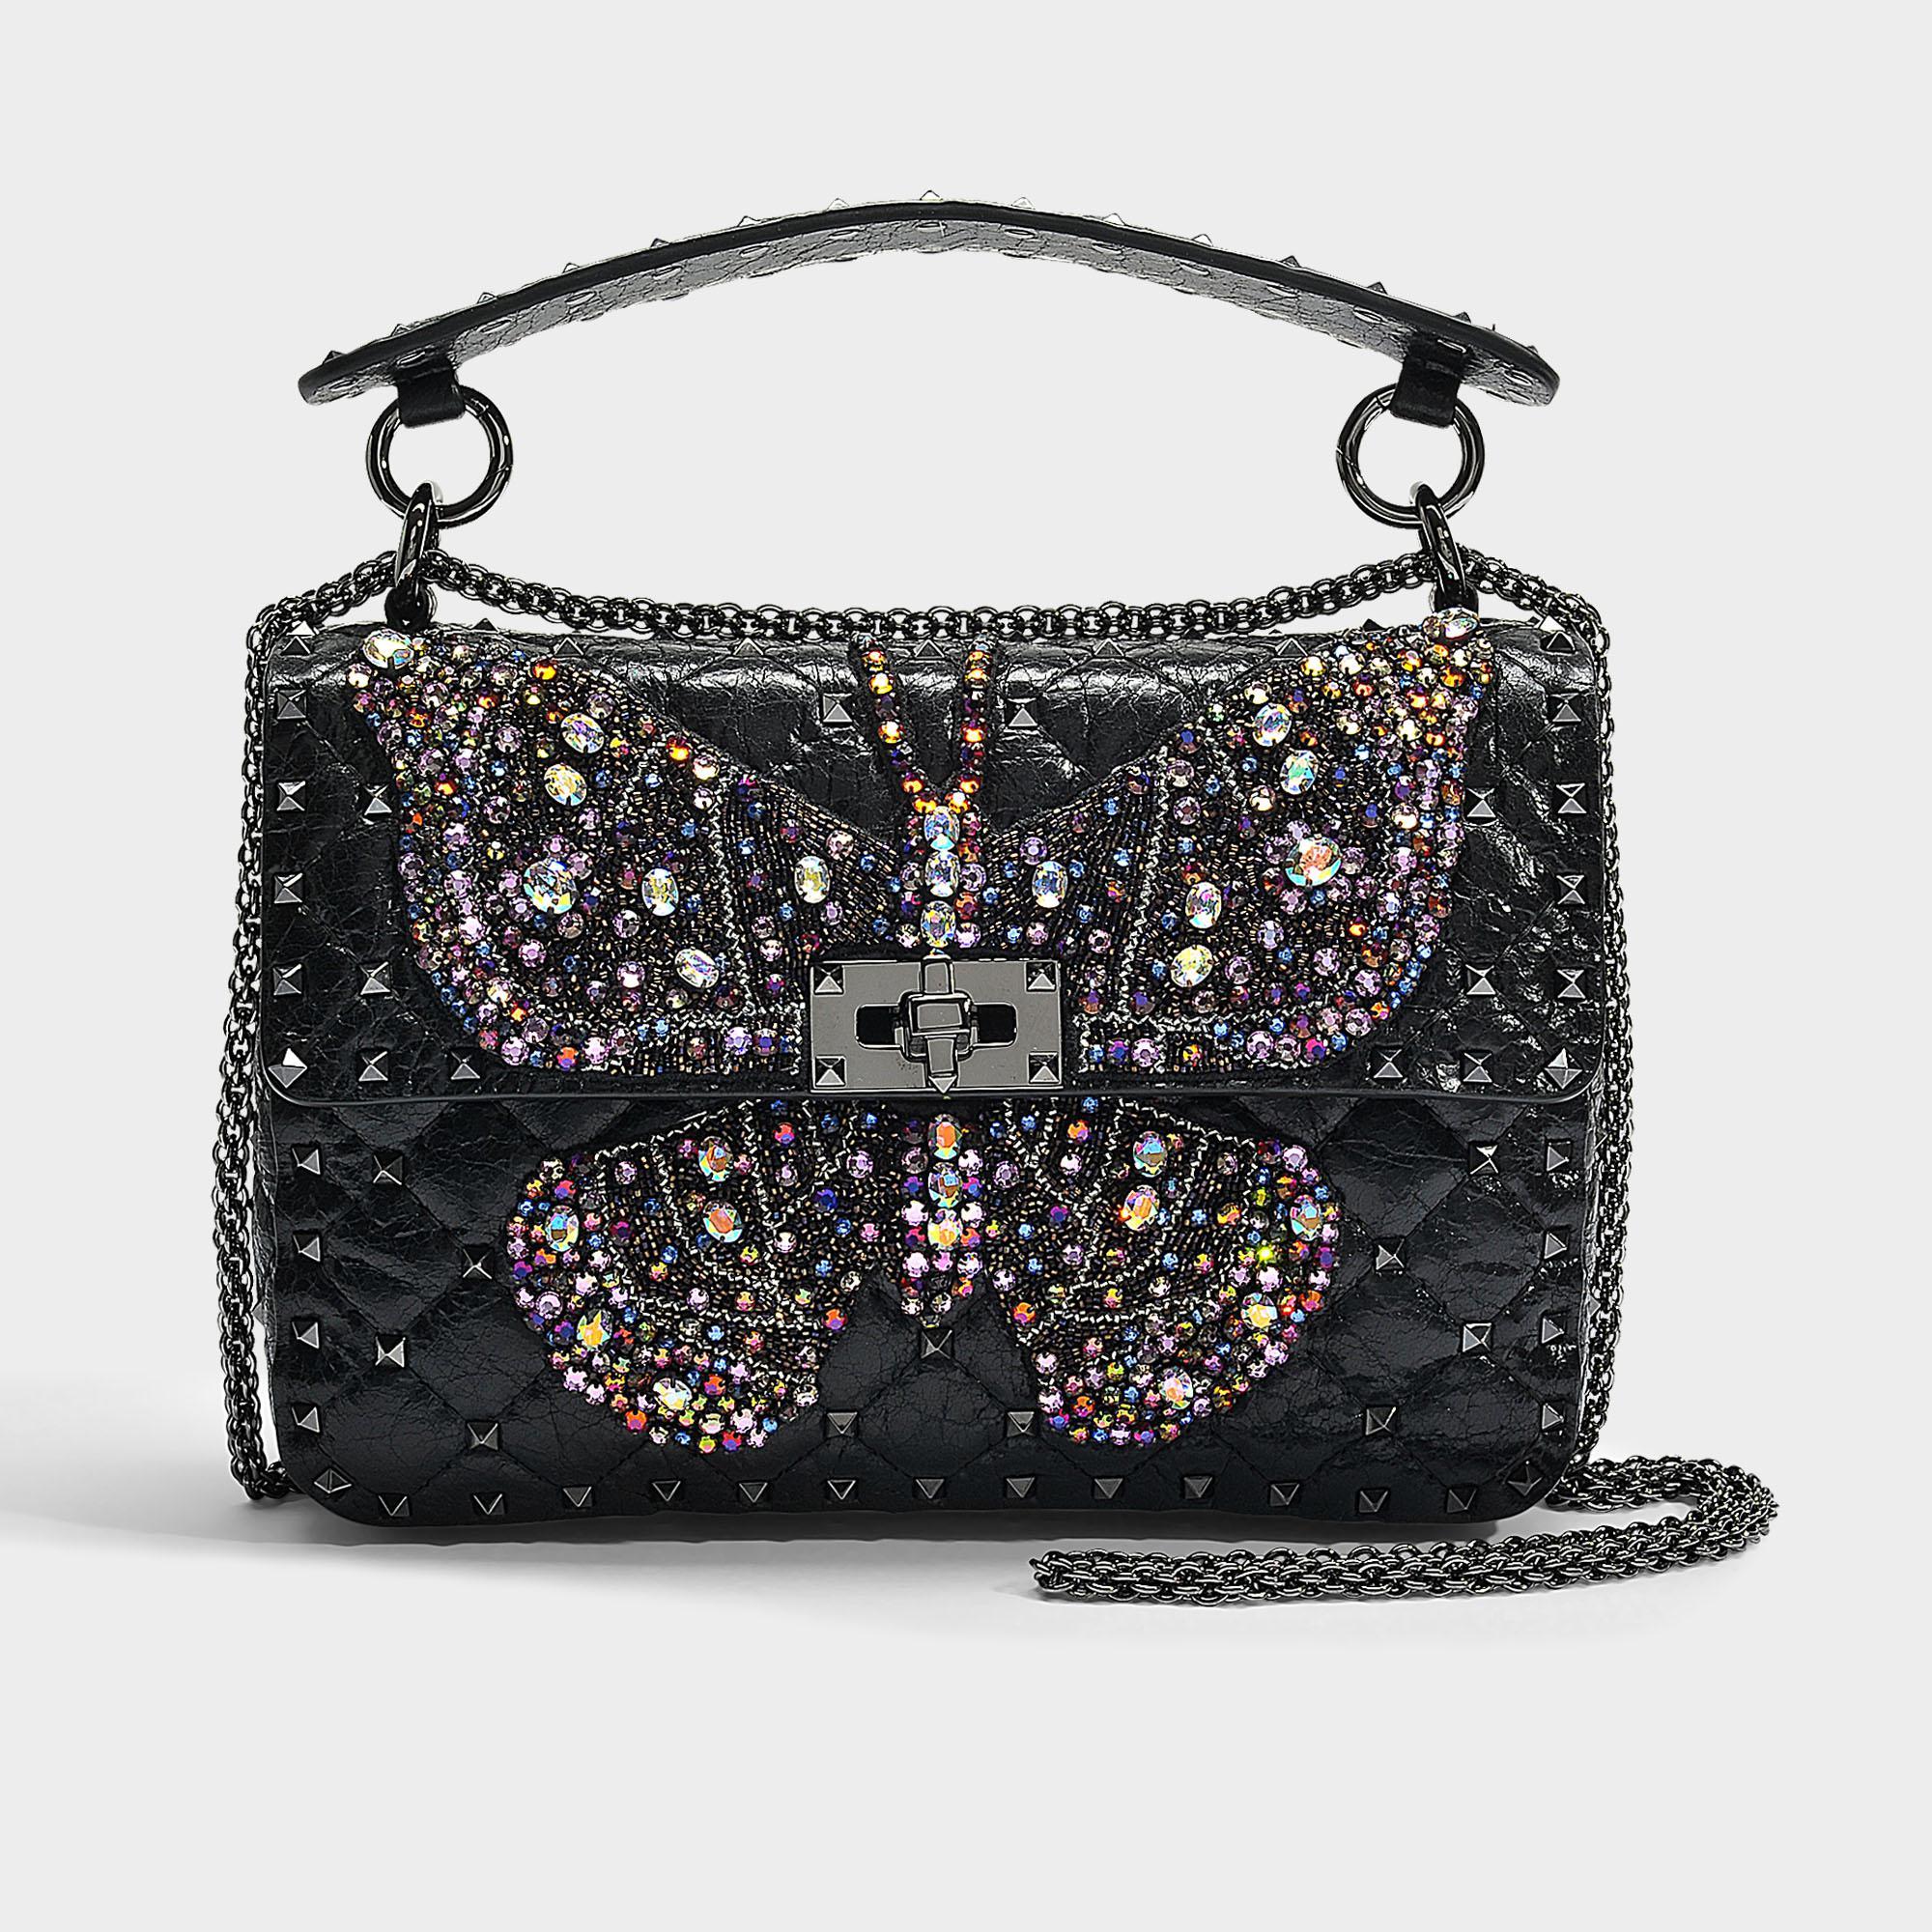 32b10f01a5 Valentino Rockstud Spike It Butterfly Medium Shoulder Bag In Black ...